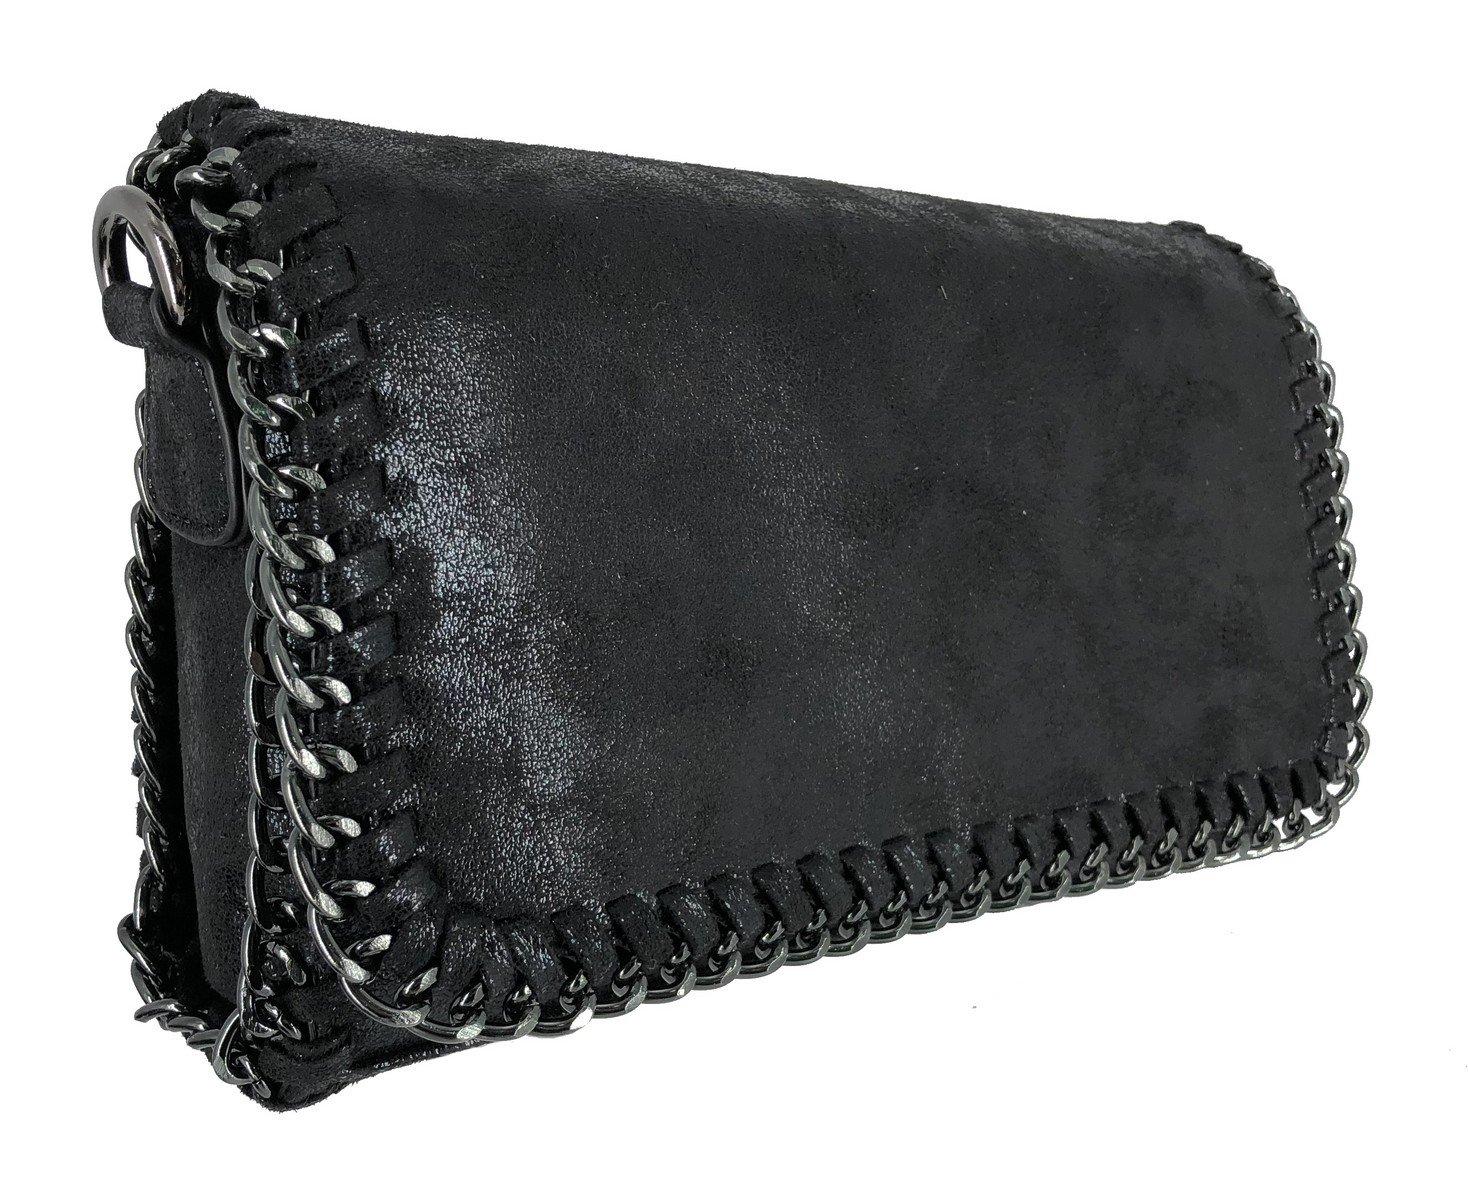 CRAZYCHIC Clutch Embrague Mini Bolsos de Fiesta Noche Brillante Metalizado Cuero de PU Gamuza Lentejuelas Crossbody Messenger Bag Moda Negro Cartera de Mano Cadena Mujer